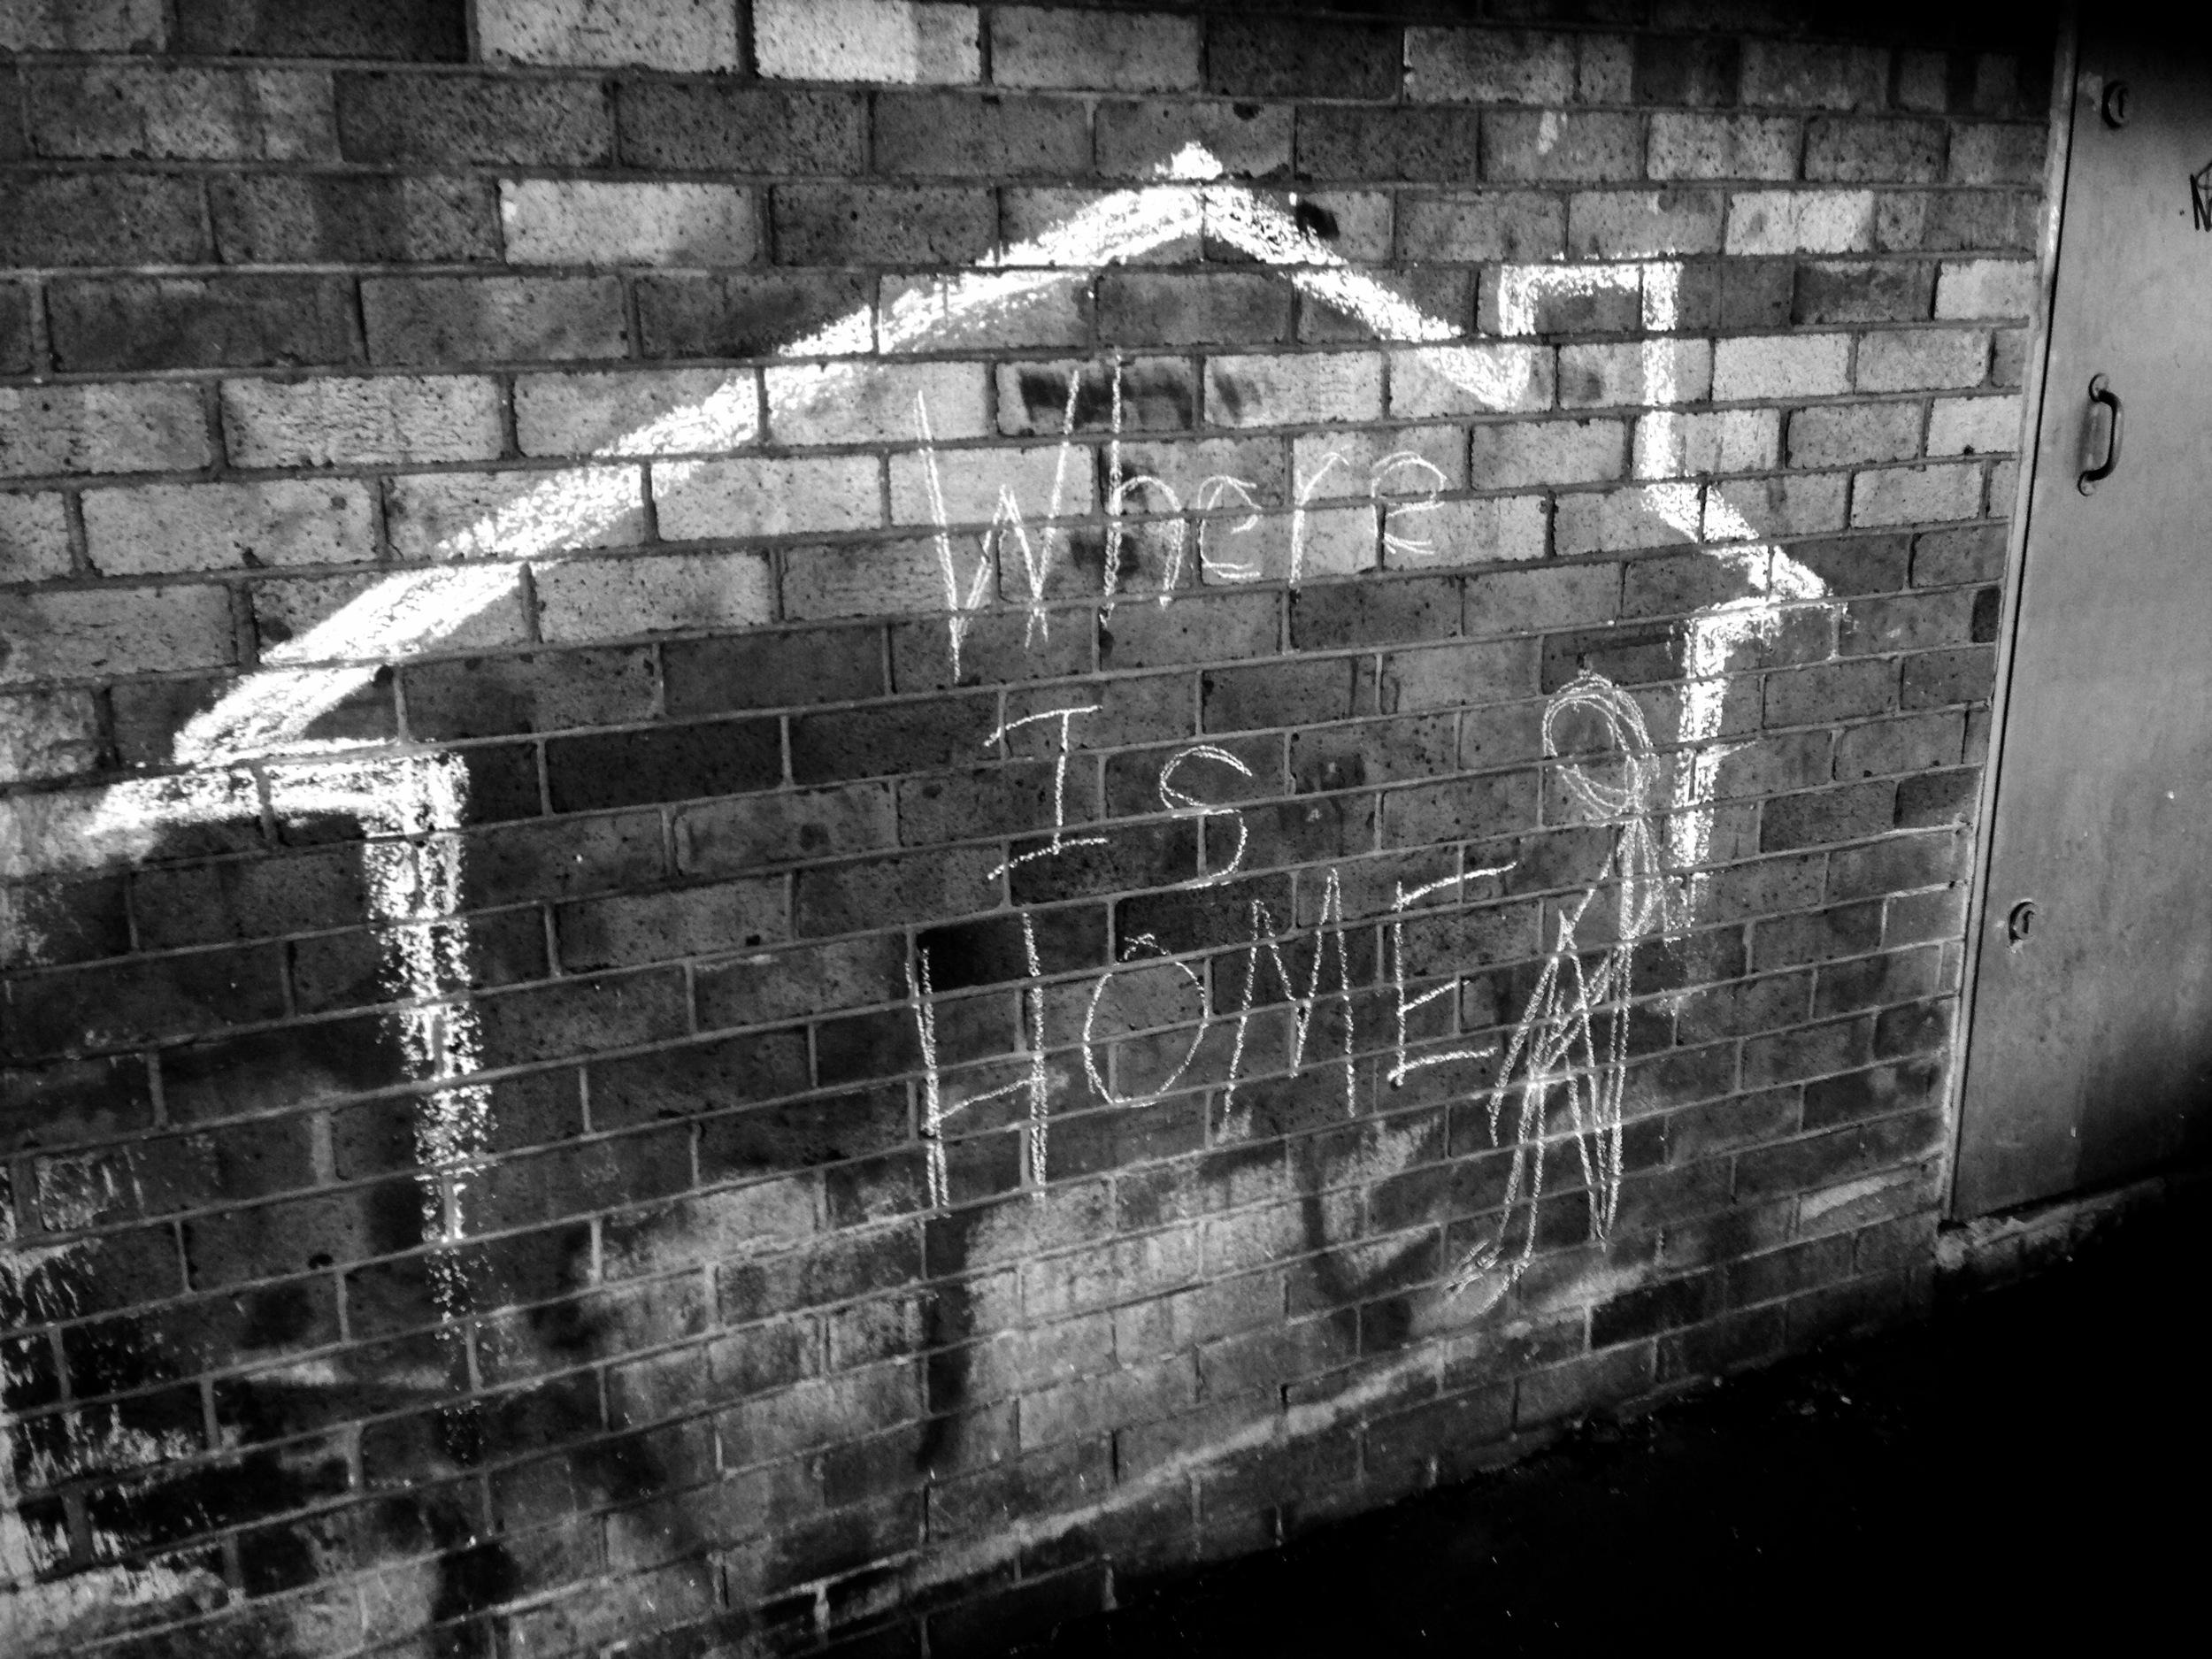 grafitti under ringroad bridge.jpg